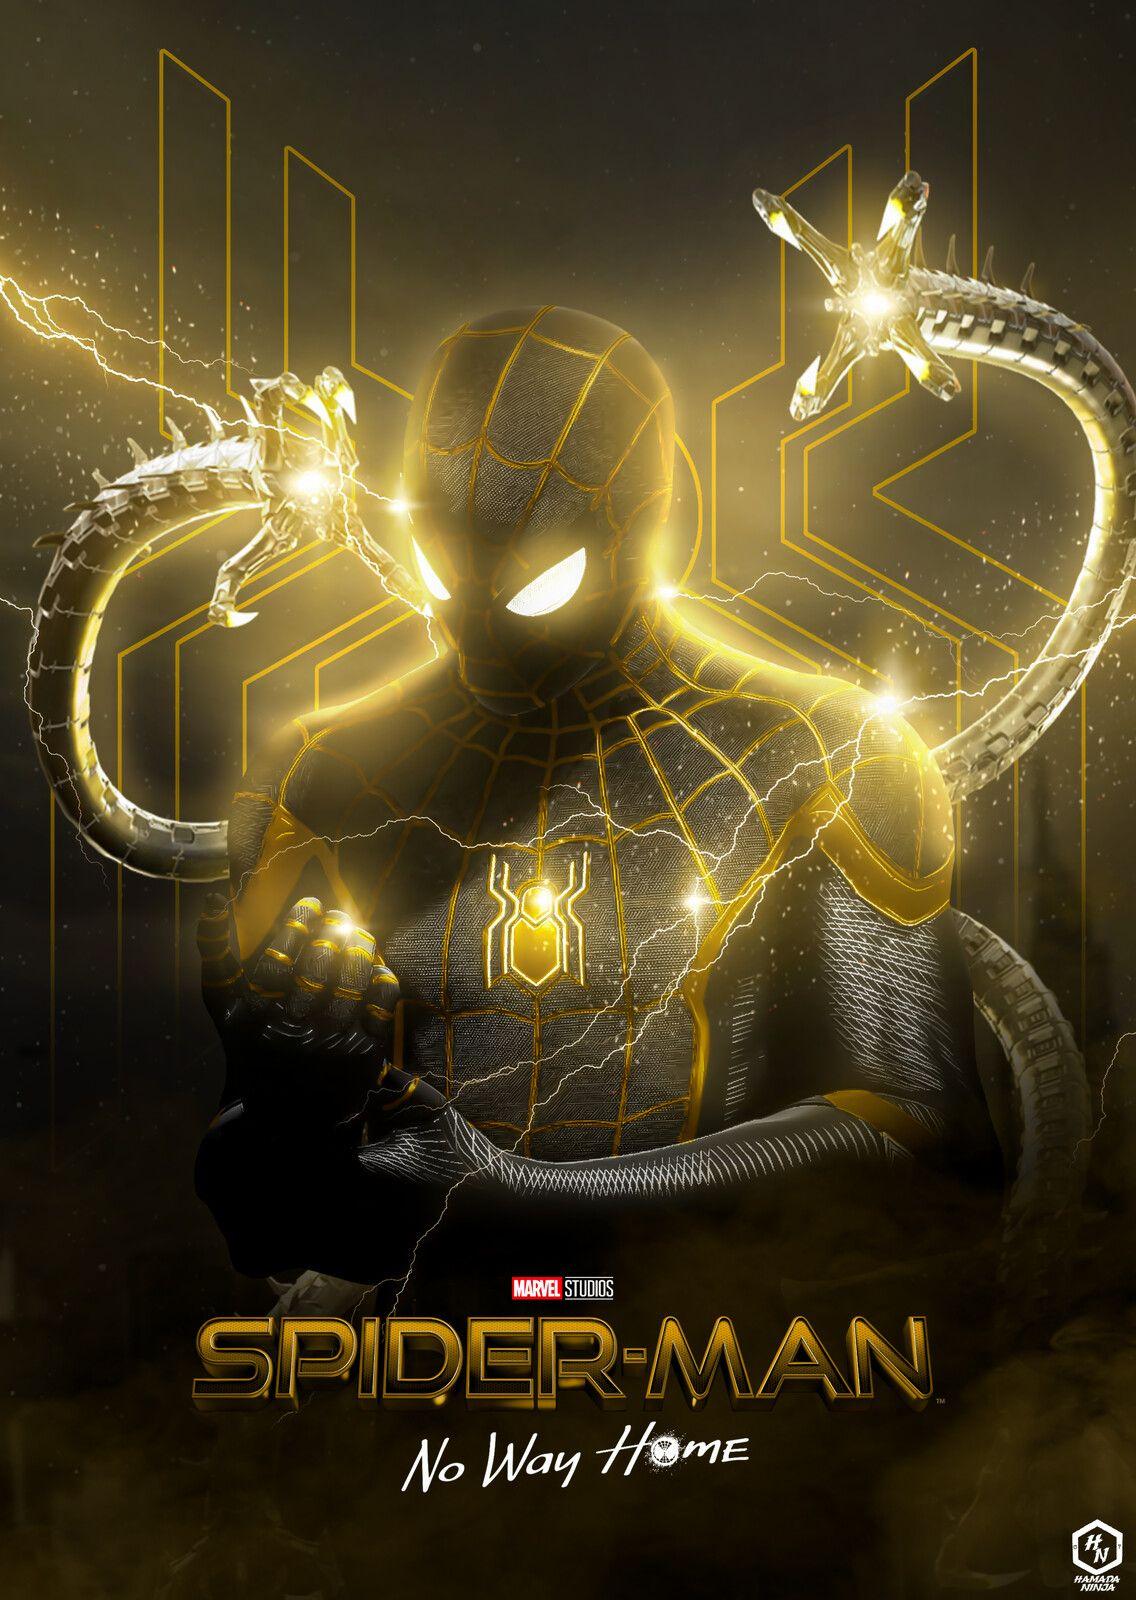 SPIDER-MAN NO WAY HOME BLACK AND GOLD POSTER BY ME HAMADA NINJA, Hamada Ninja